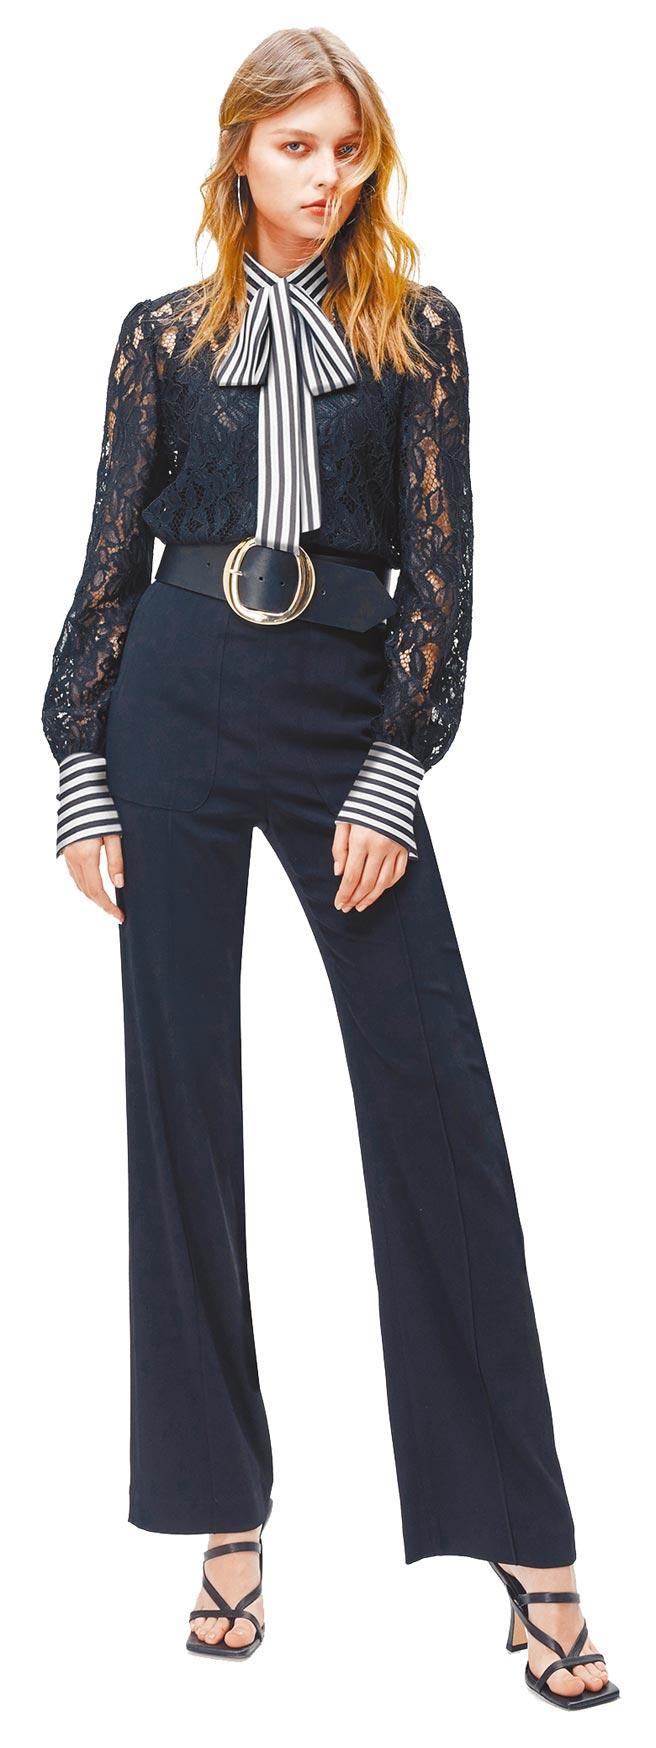 SOGO復興館KAO MEIFEN高美芬蕾絲上衣1萬4980元、經典套裝褲8980元。(SOGO提供)